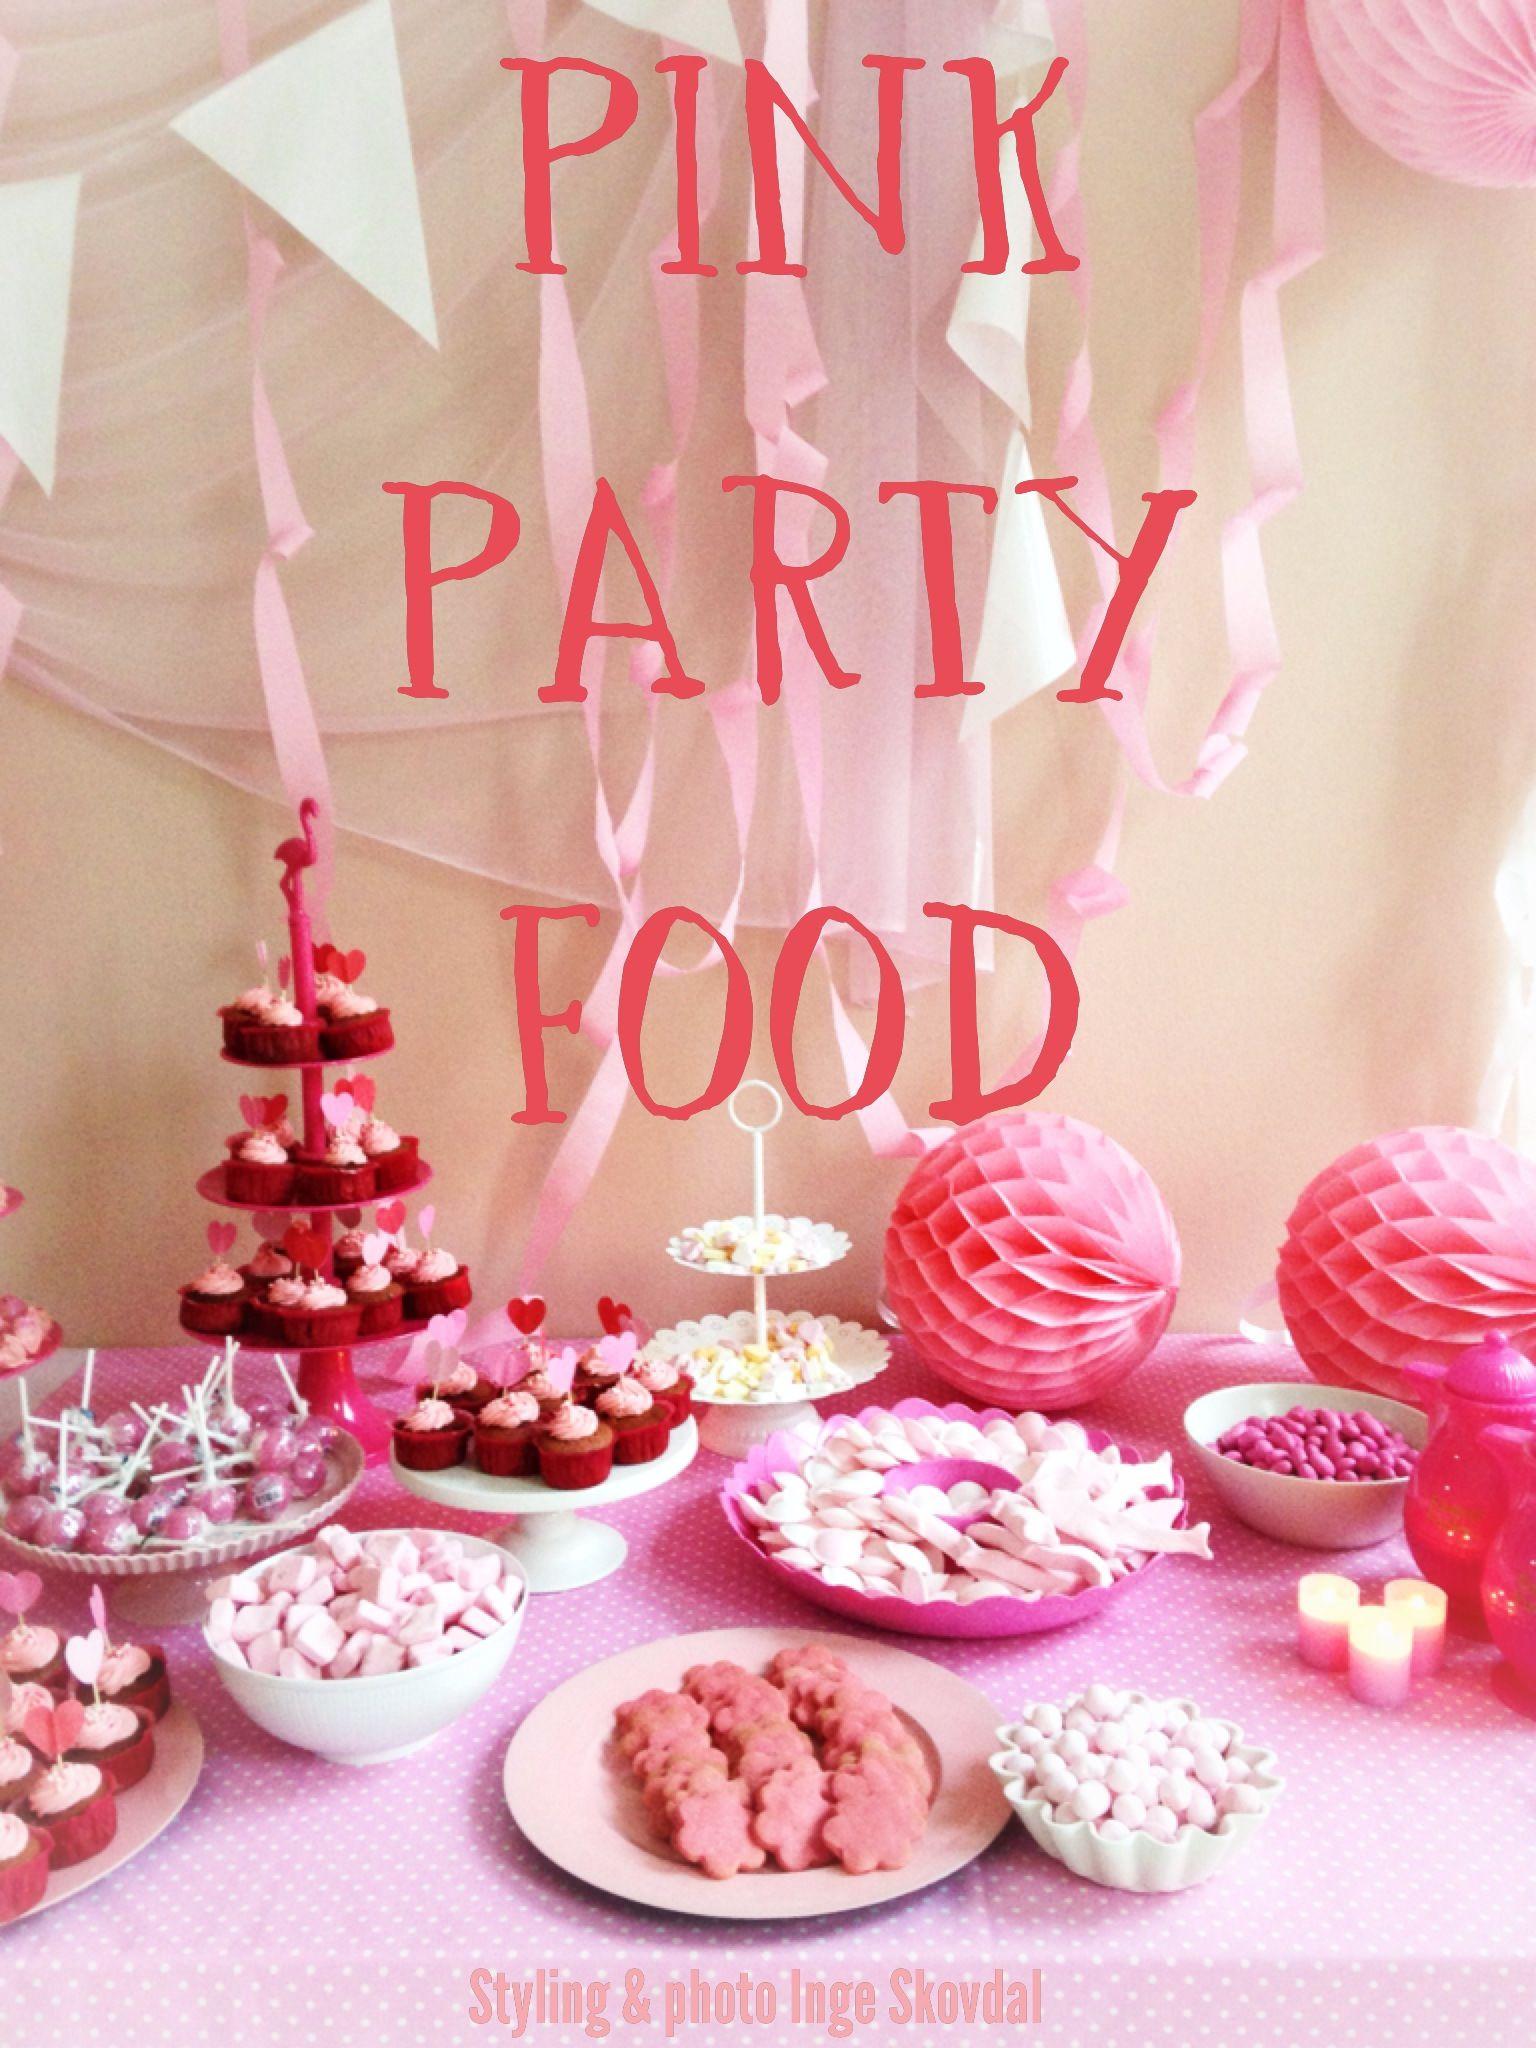 Pink Party Food Ideas  pink party food Styling & photo Inge Skovdal